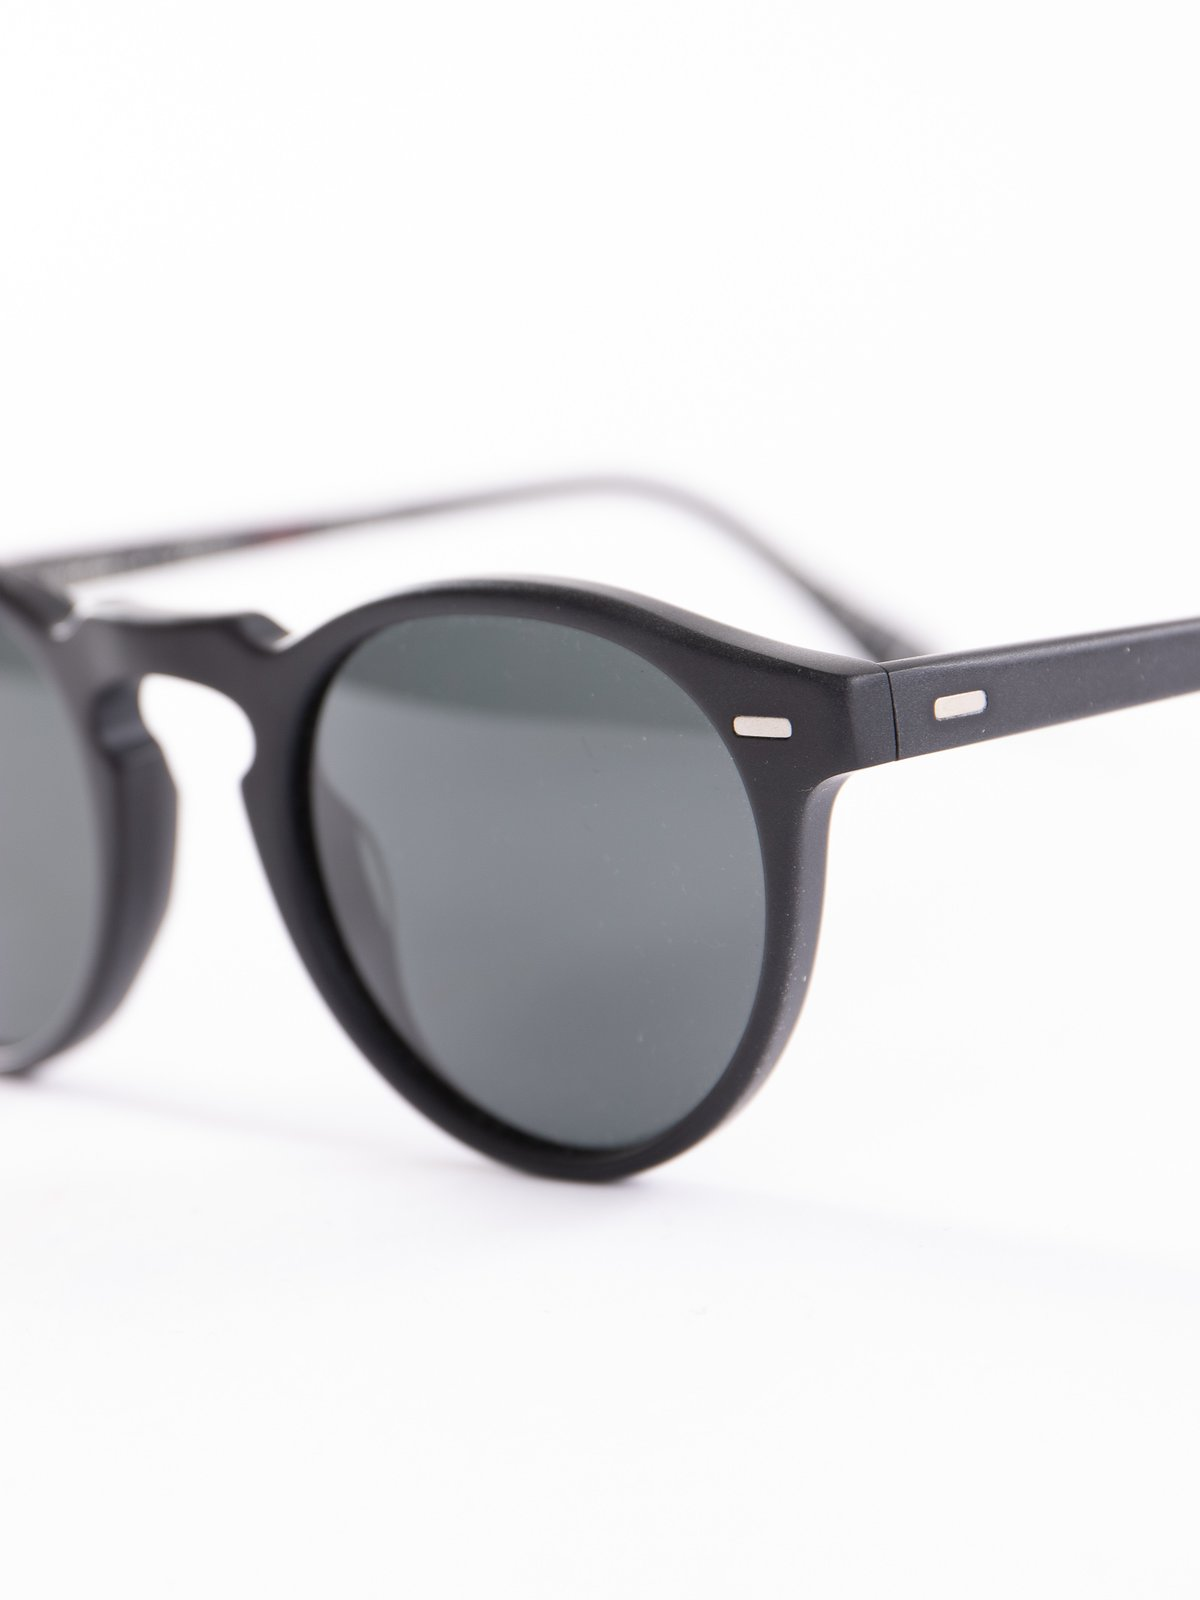 Semi–Matte Black/Dark Grey Polar Gregory Peck Sunglasses - Image 3